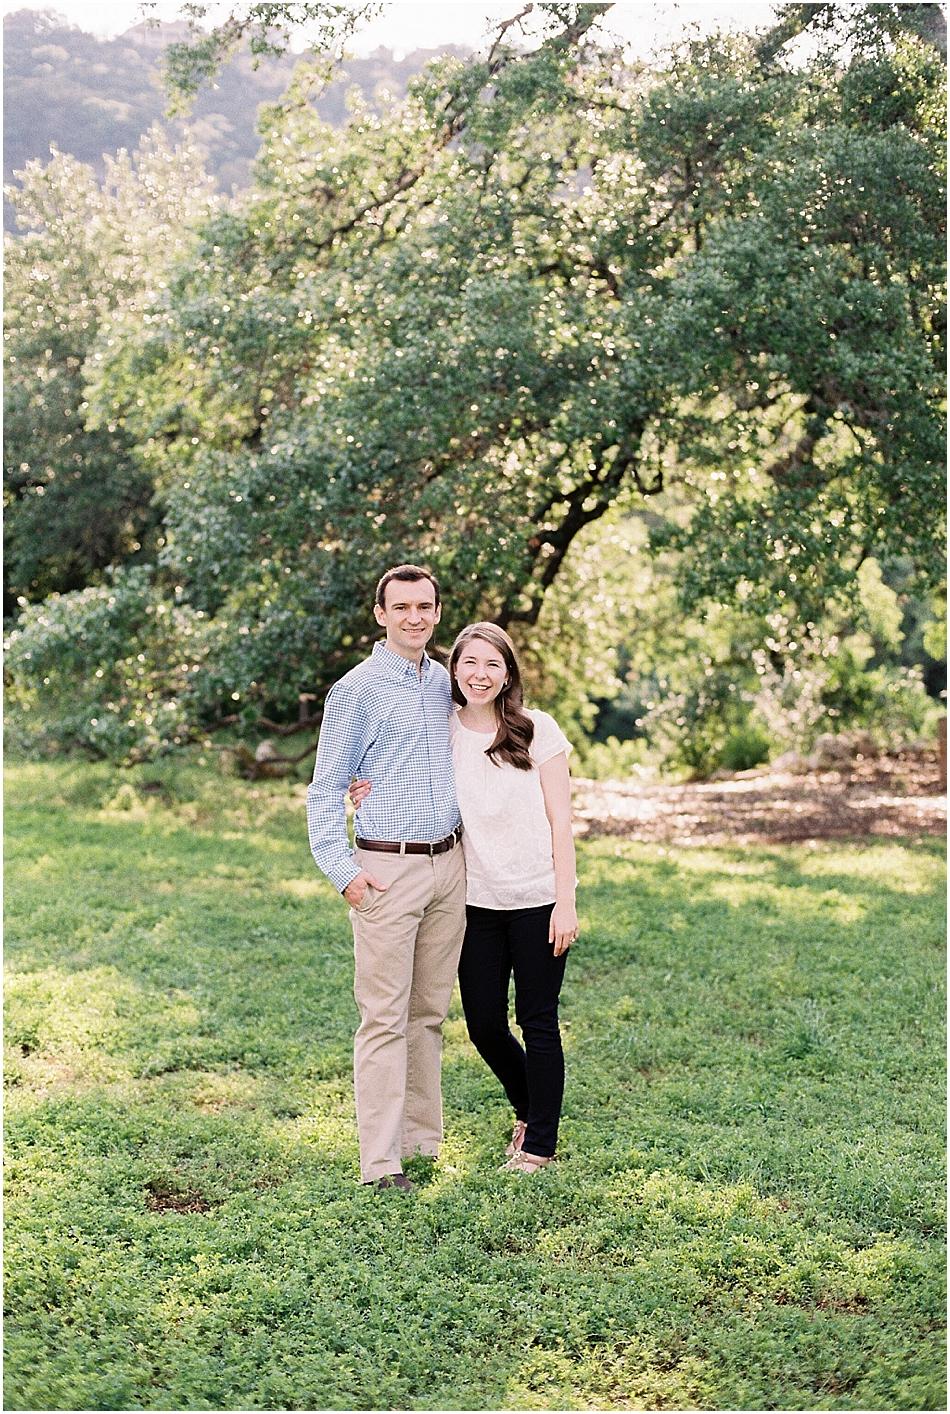 Laura + Nick | Engagement | Fine Art Film | Austin Texas | Emilie Anne Photography-8.jpg